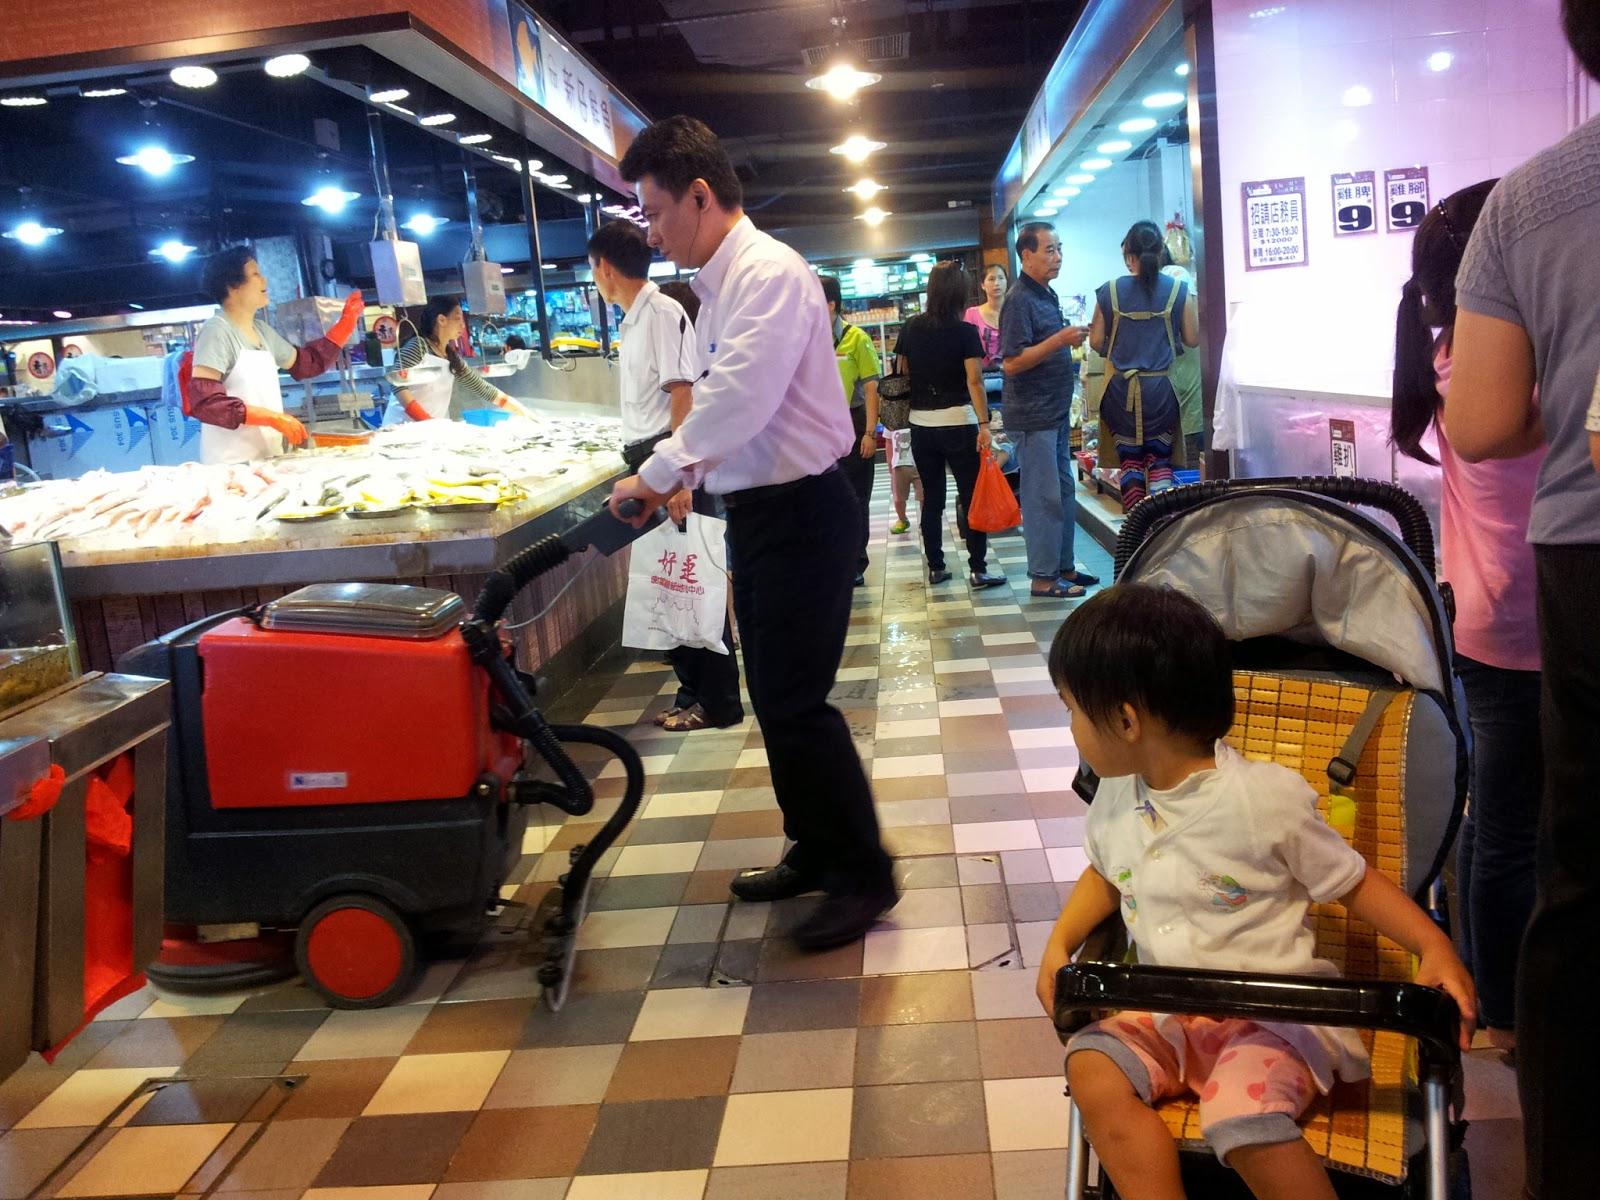 Grassroots O2: 巡視業務.領匯.天瑞商場 @2014-07-19